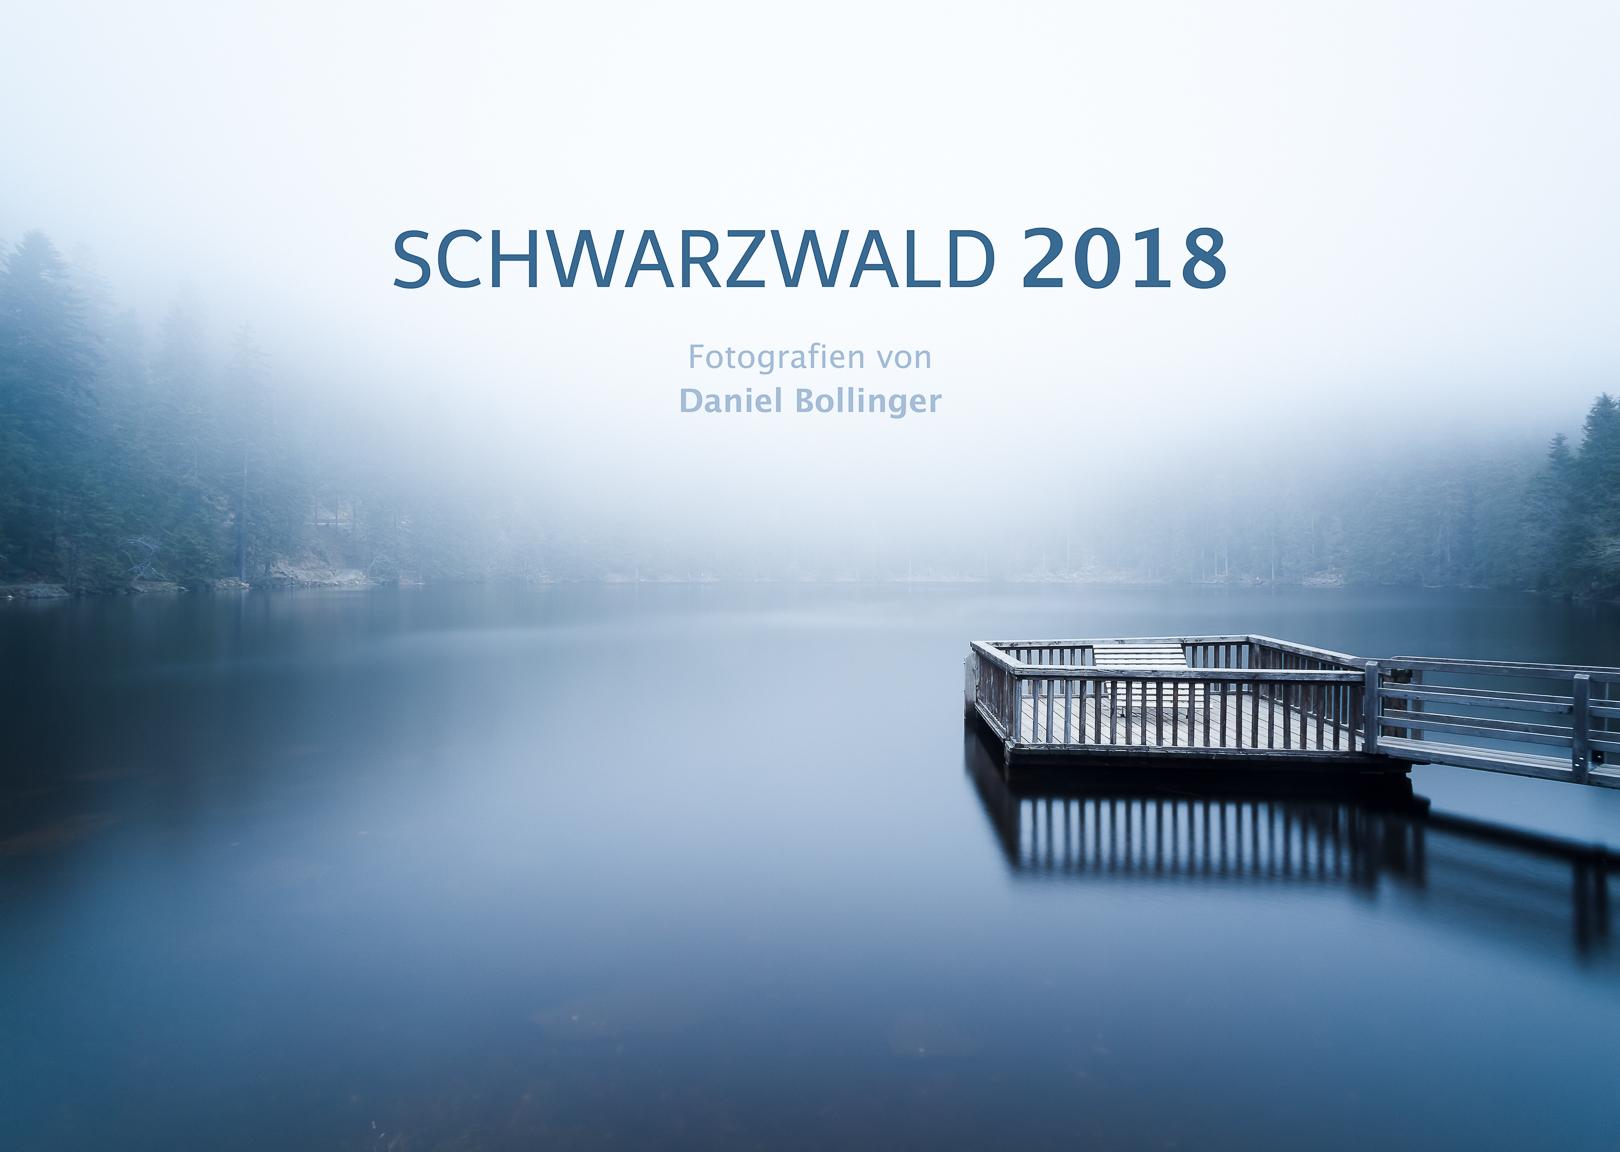 Schwarzwald-Kalender 2018 Titelblatt